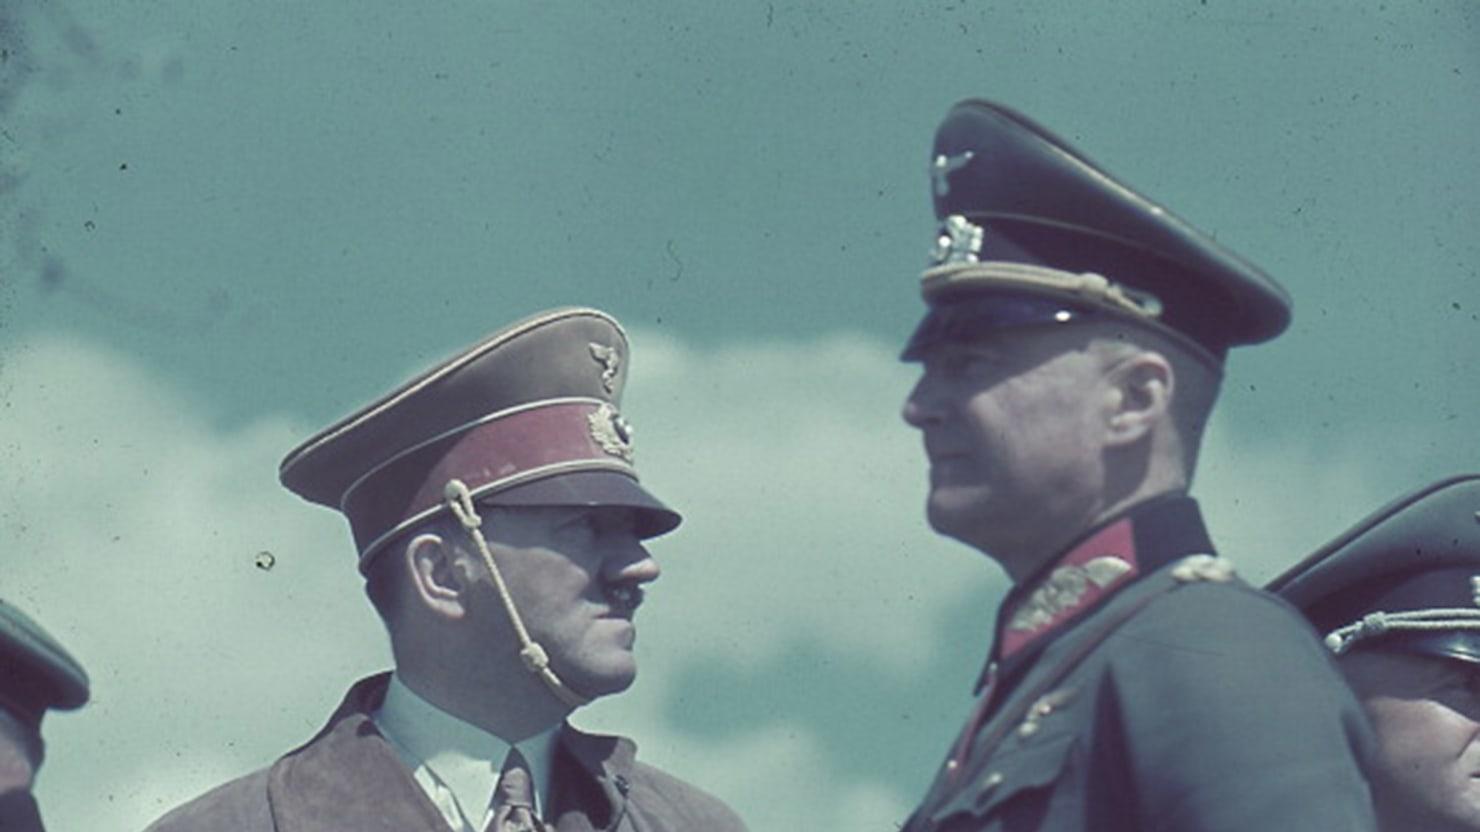 Ron Rosenbaum on Hitler, Hollywood, and Quantifying Evil